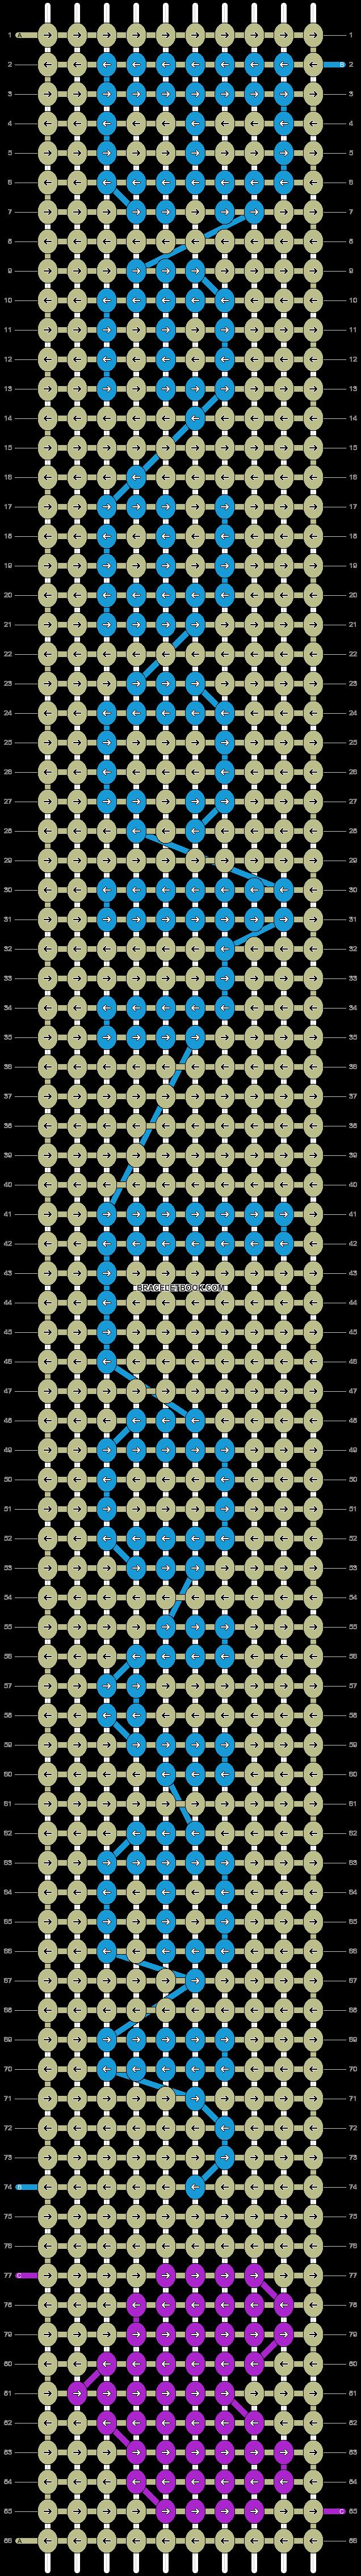 Alpha pattern #4781 pattern